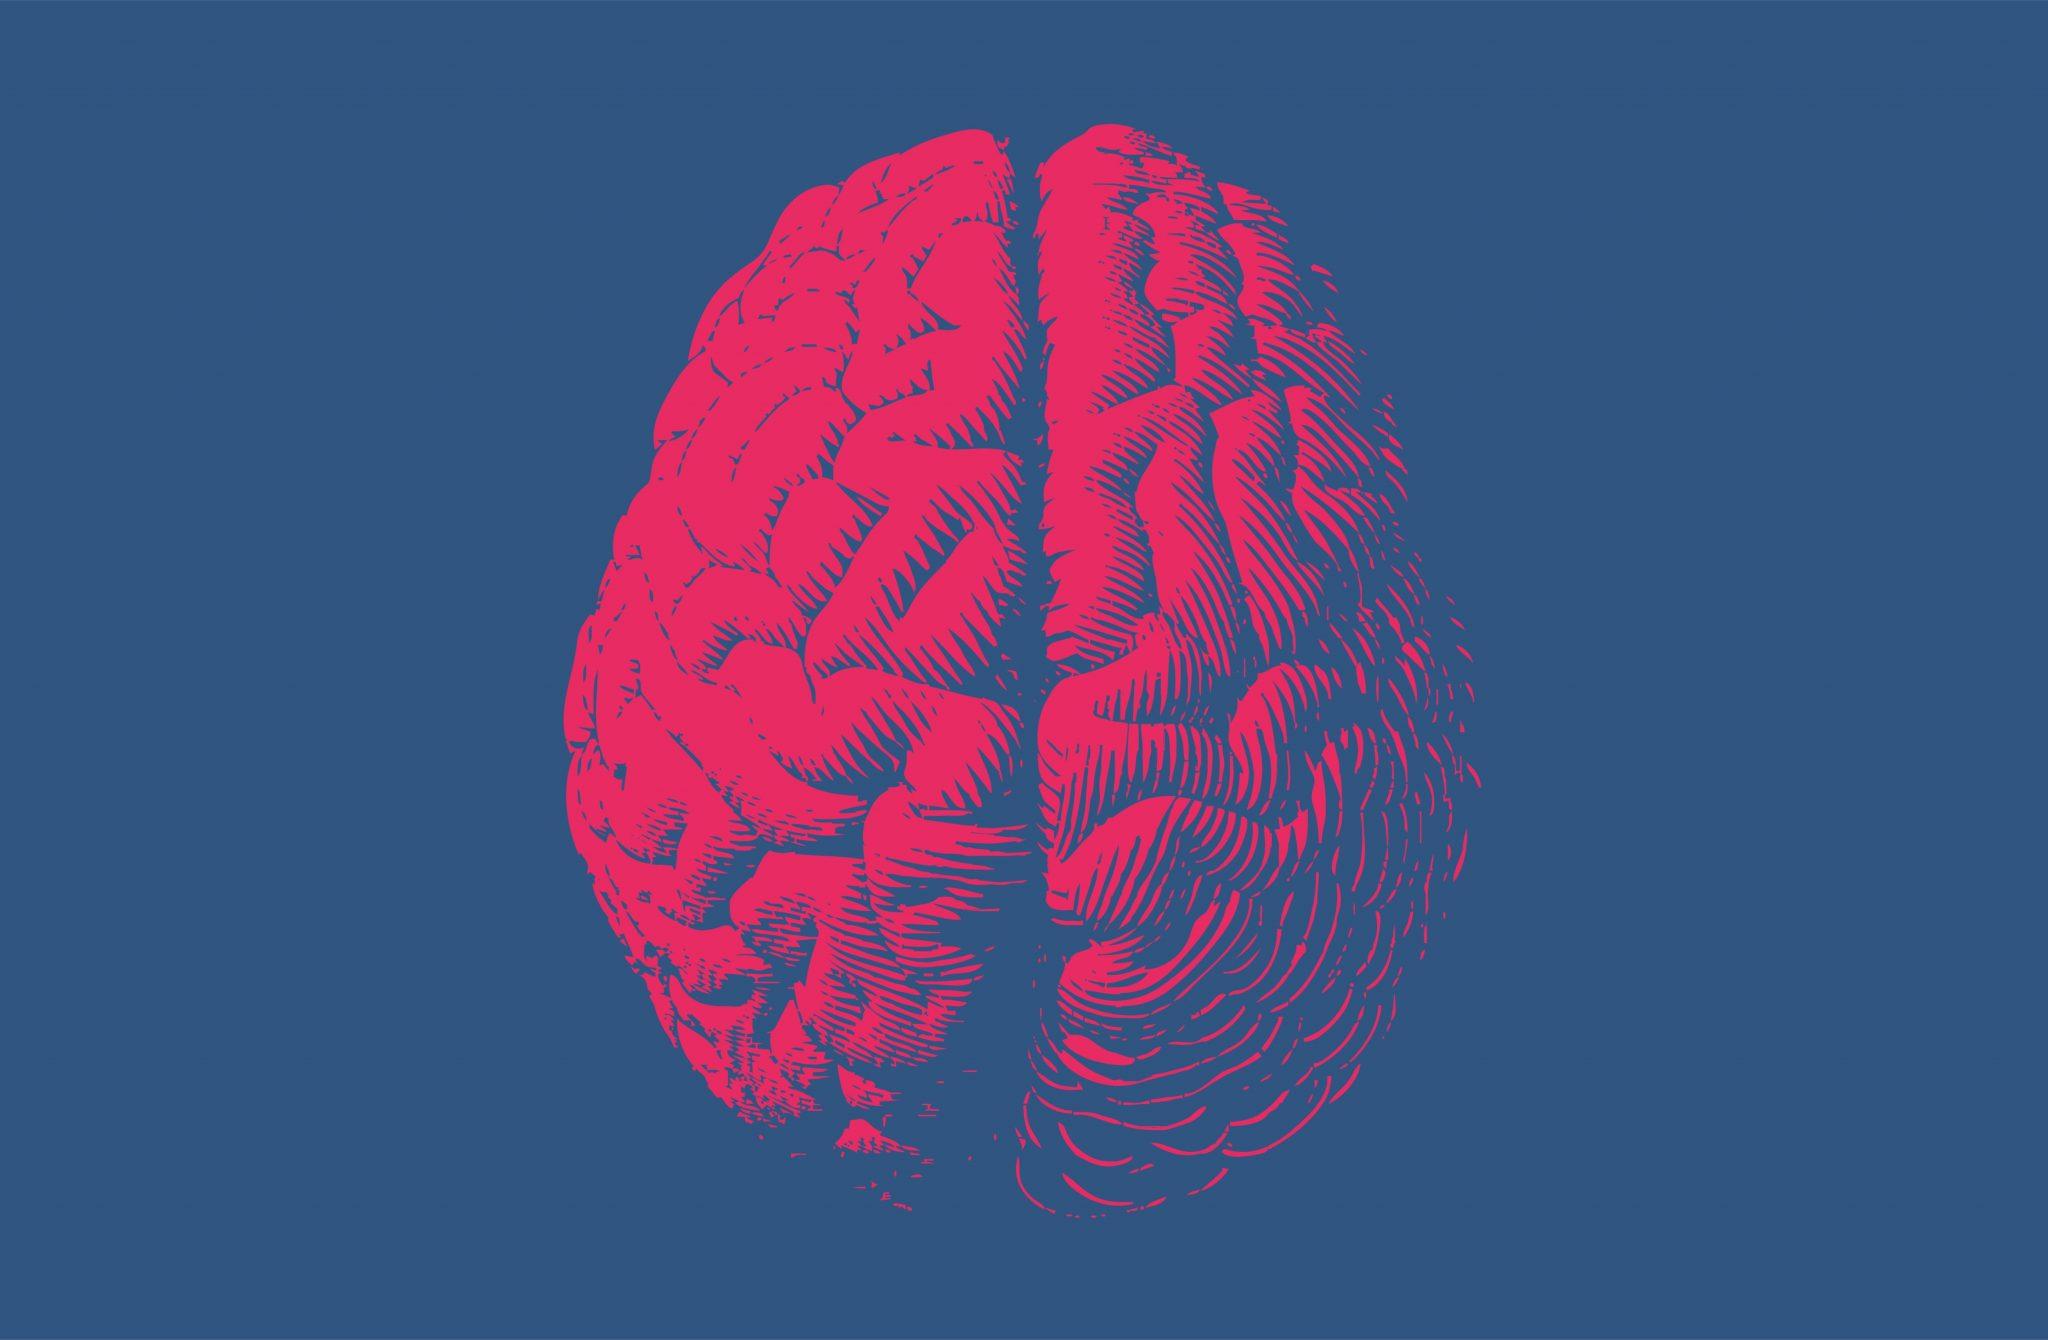 pink brain on blue background